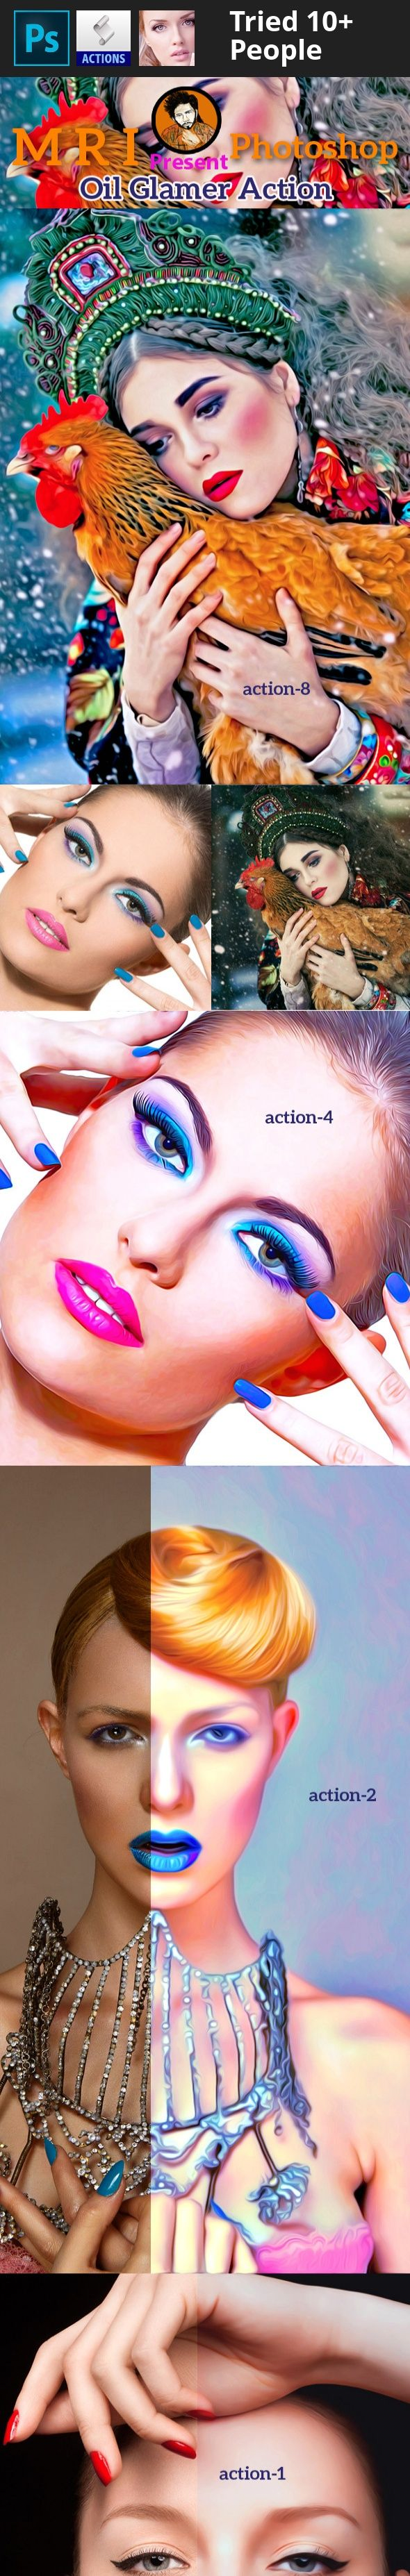 art, artist, color modify, color tone, color variation, comics, digital art, flayer action, fresh action, HDR Action, Image actions, image effects, images, movie poster, mri action, mri art, oil action, oil art, photo editor, pop art   D ARTIST MRI …... Presenting….Oil Glamer Action /strong>   Product : Oil Glamer Action Publish : Graphic River.   Publish Date :   Photos :  Working Software Version : CS6 English Version.   Software  support version : CS6, English Version.   Not:...